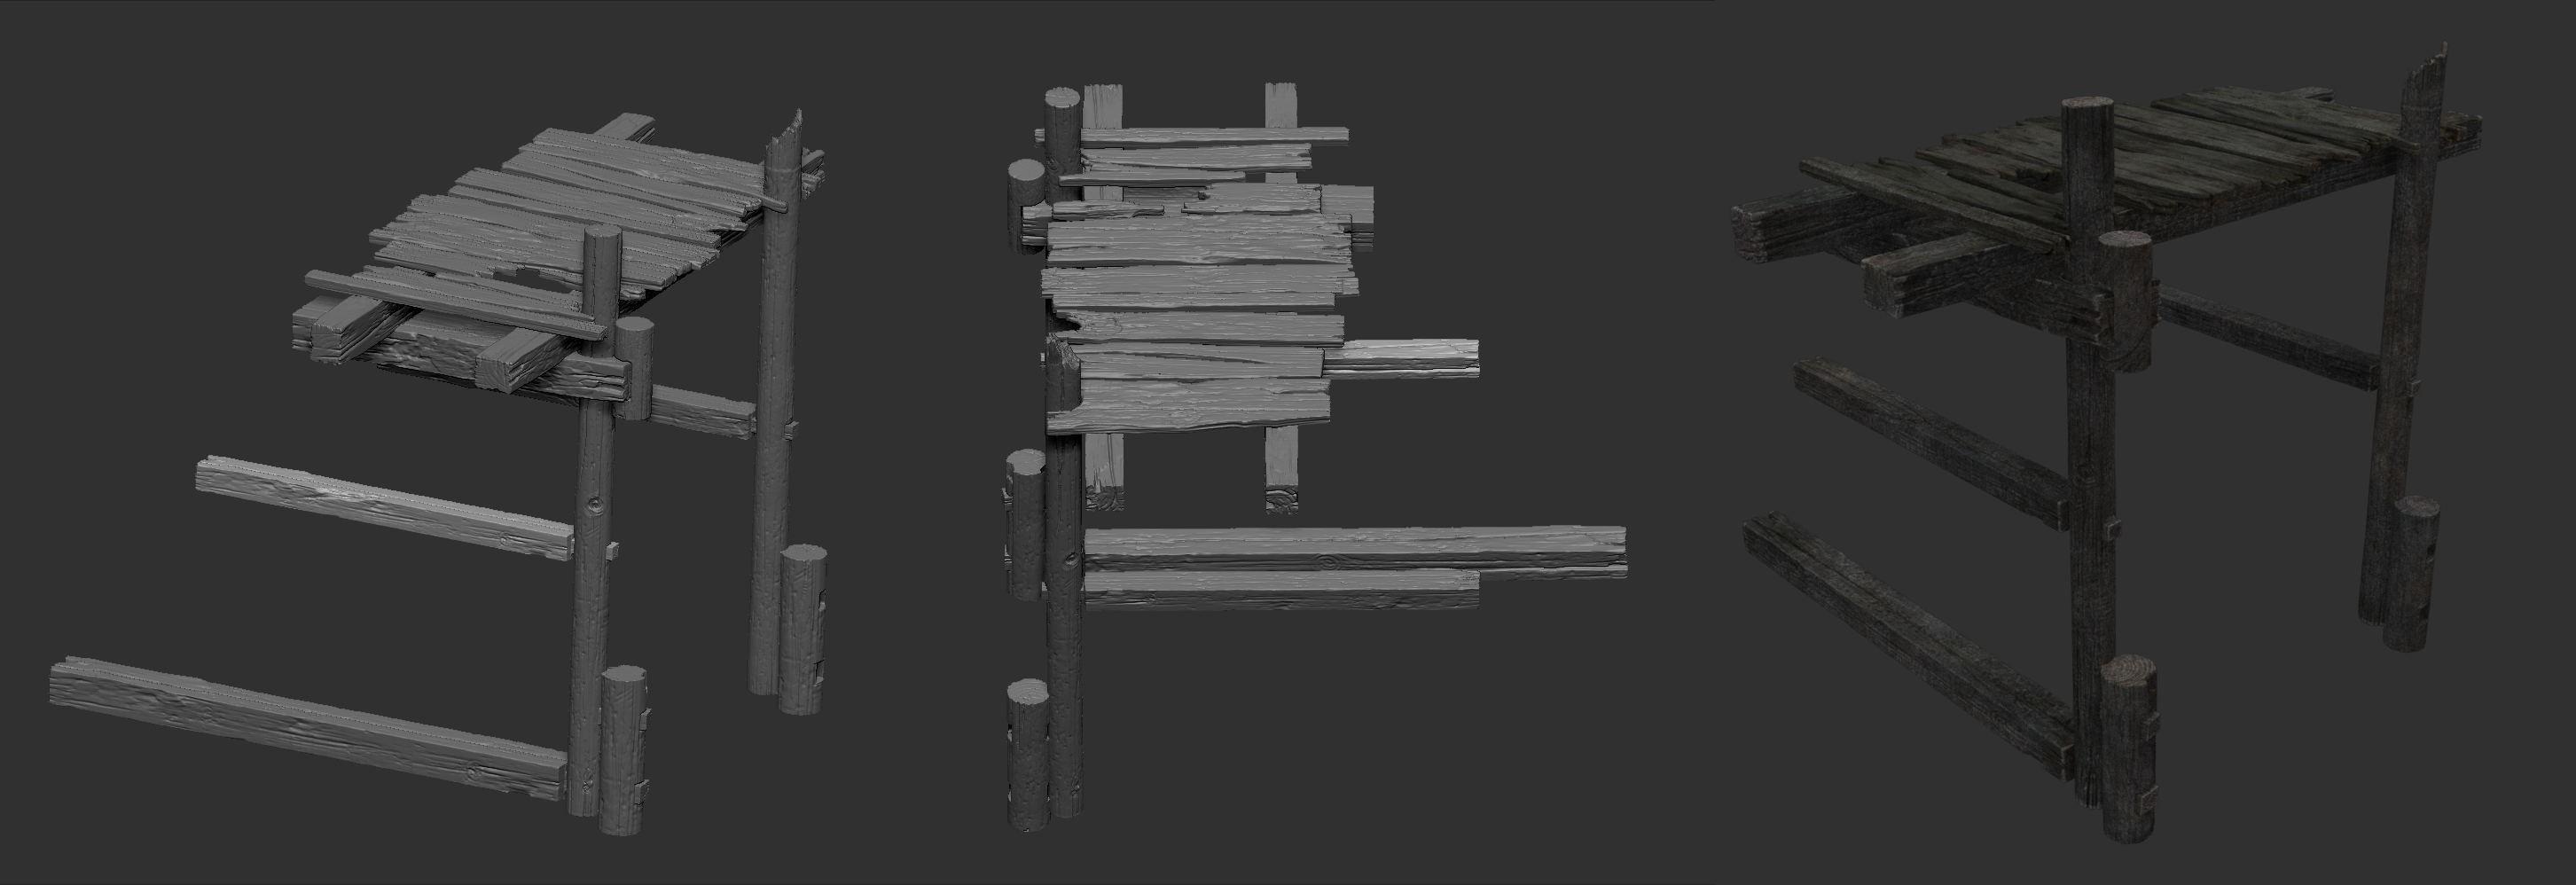 木头台阶 由 yangwenbo